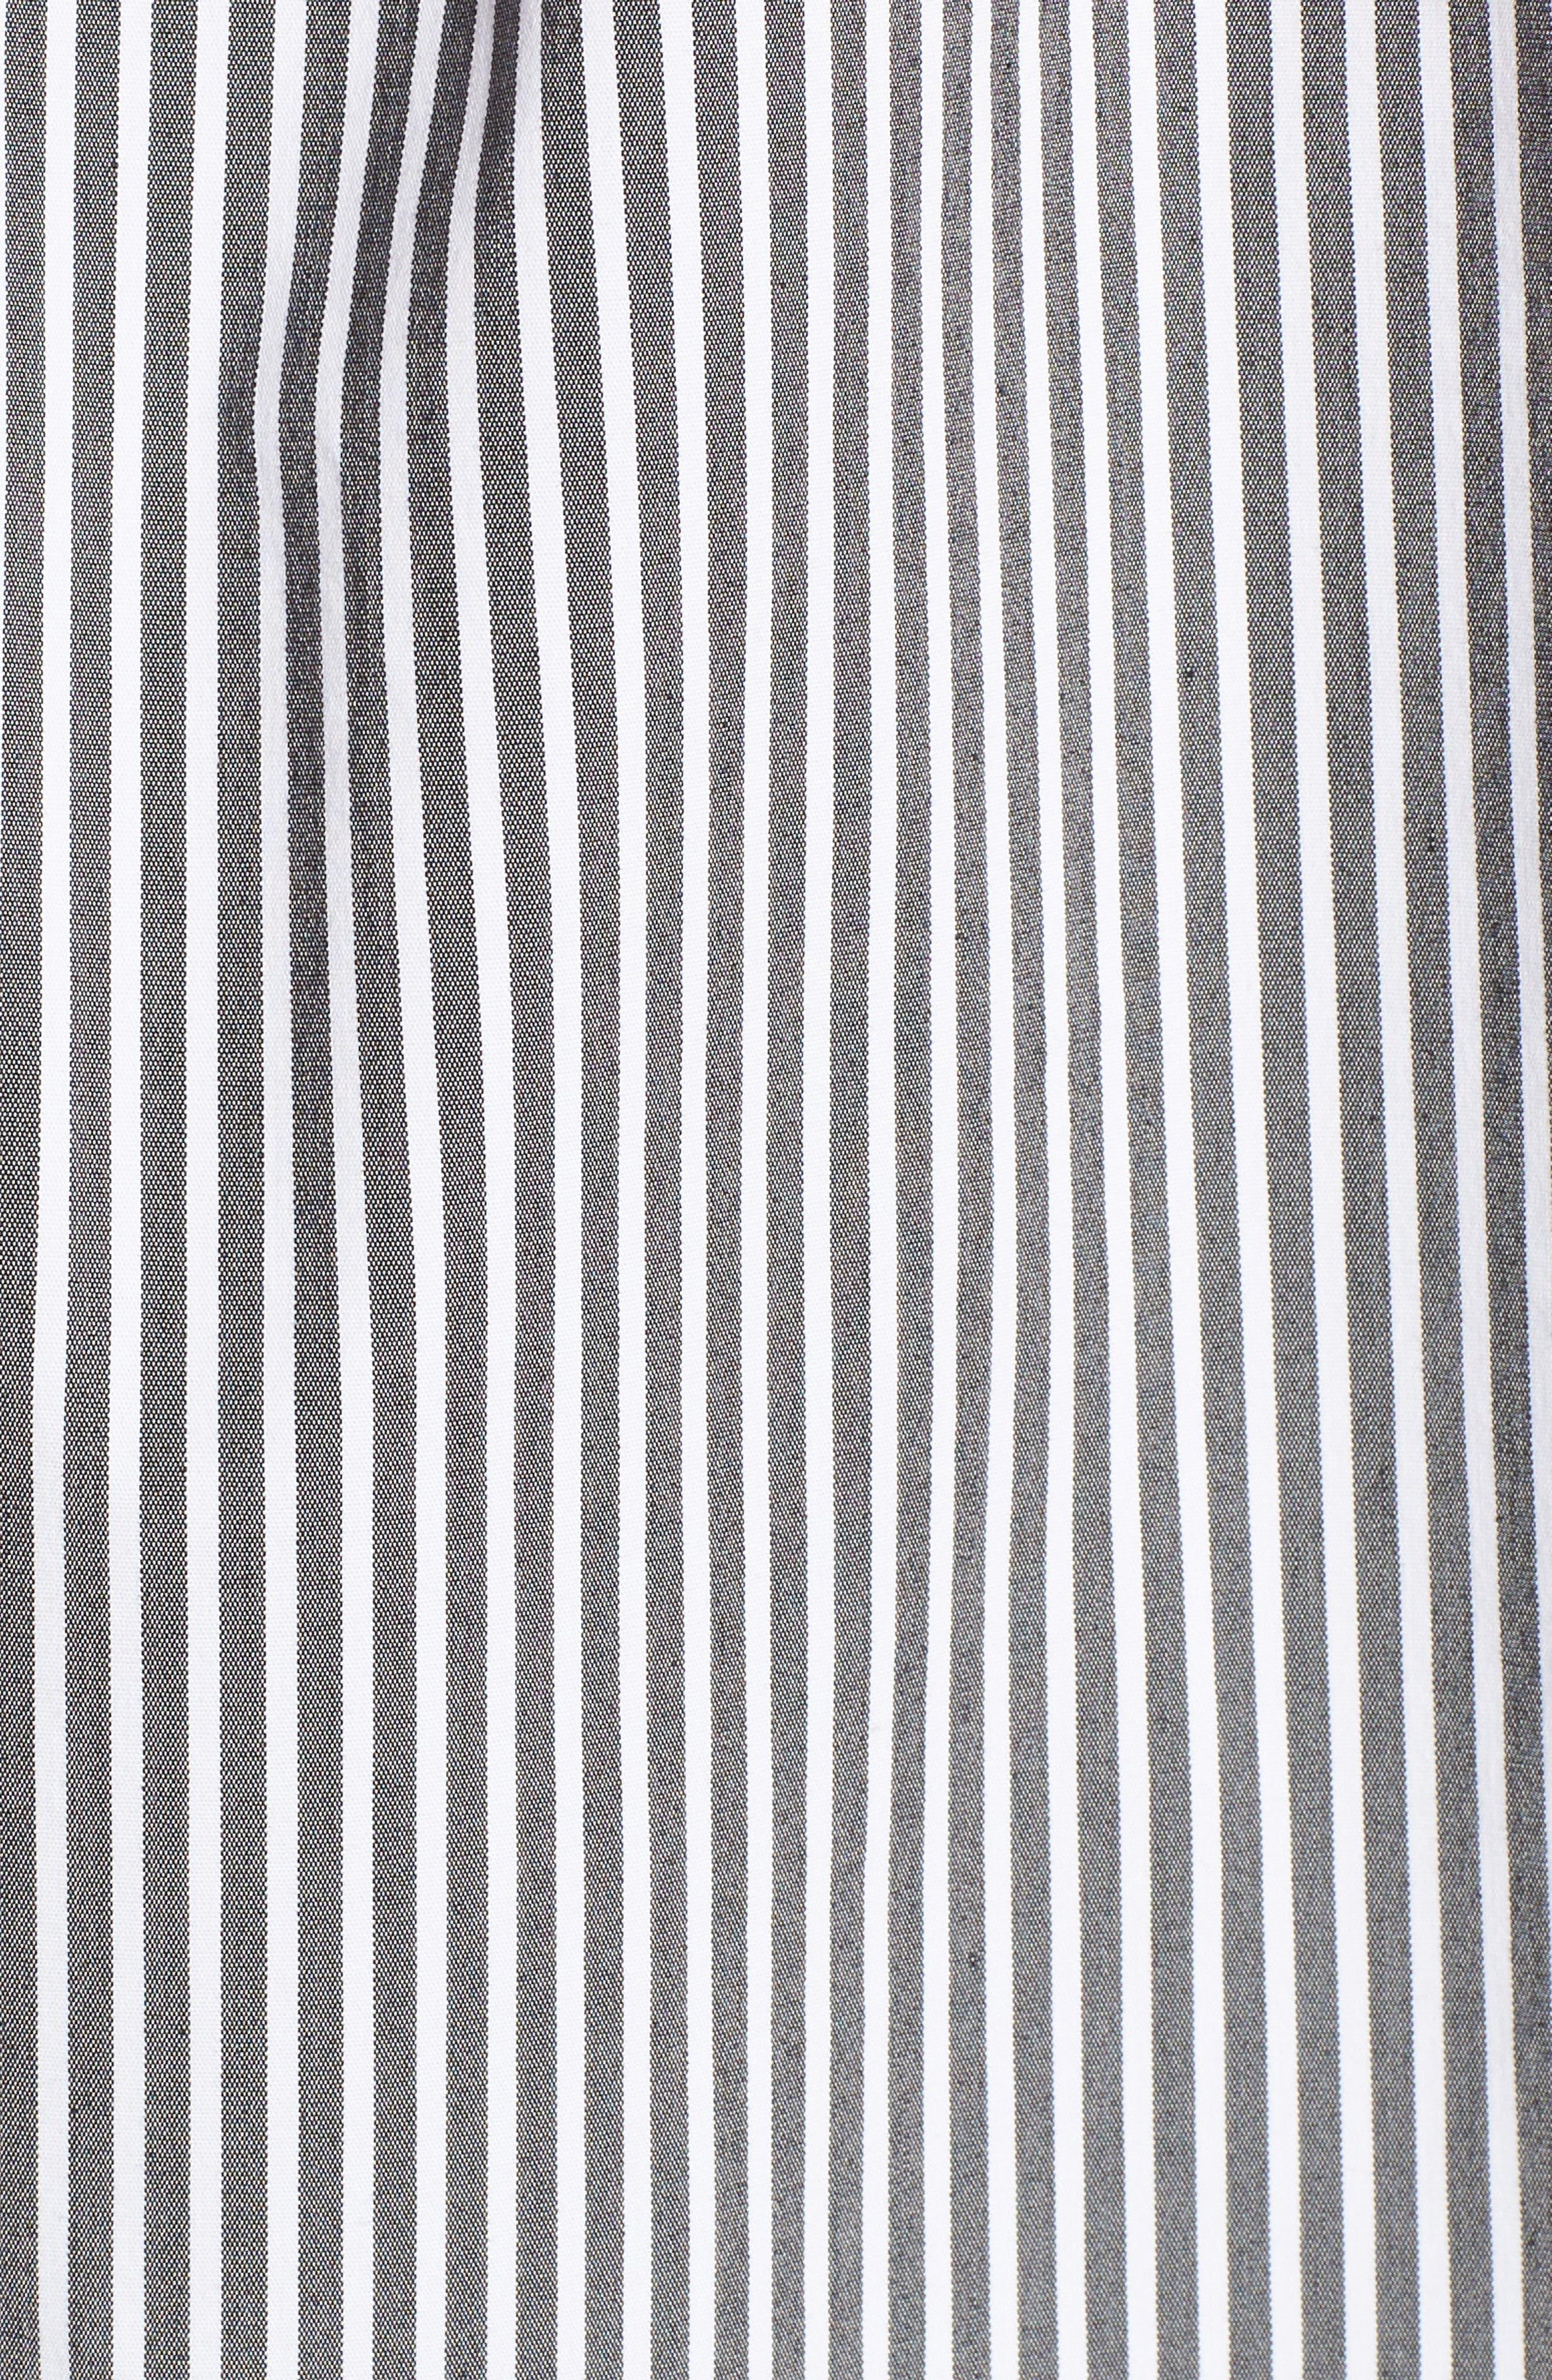 Alternate Image 6  - Vince Camuto Ruffle One-Shoulder Blouse (Regular & Petite)